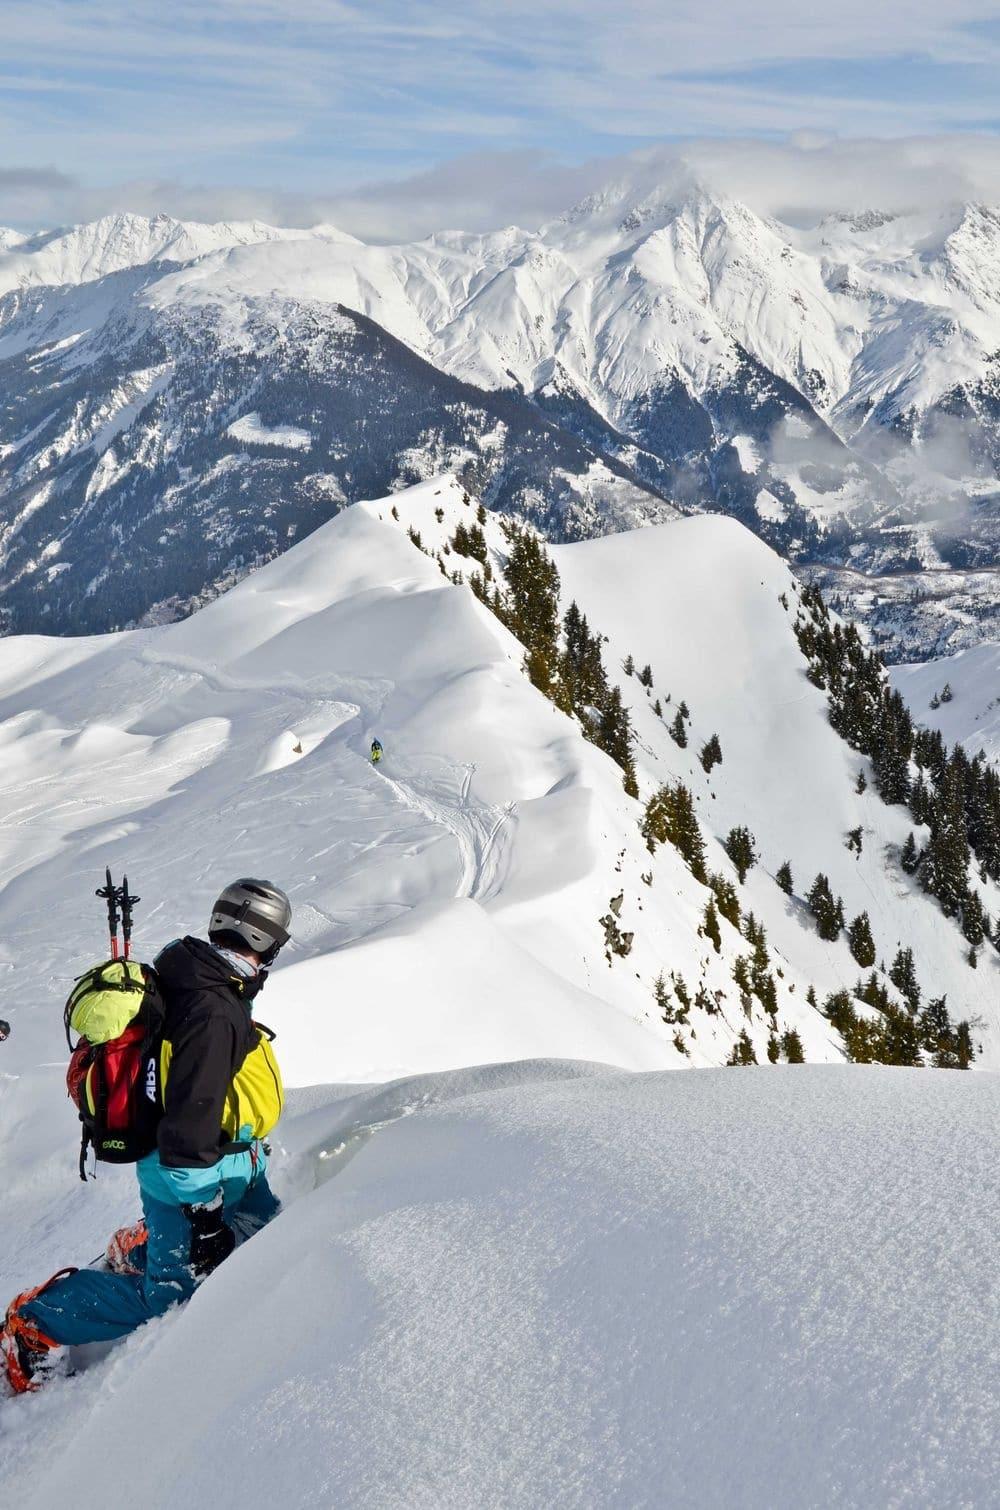 Die optimale Skitourenausrüstung